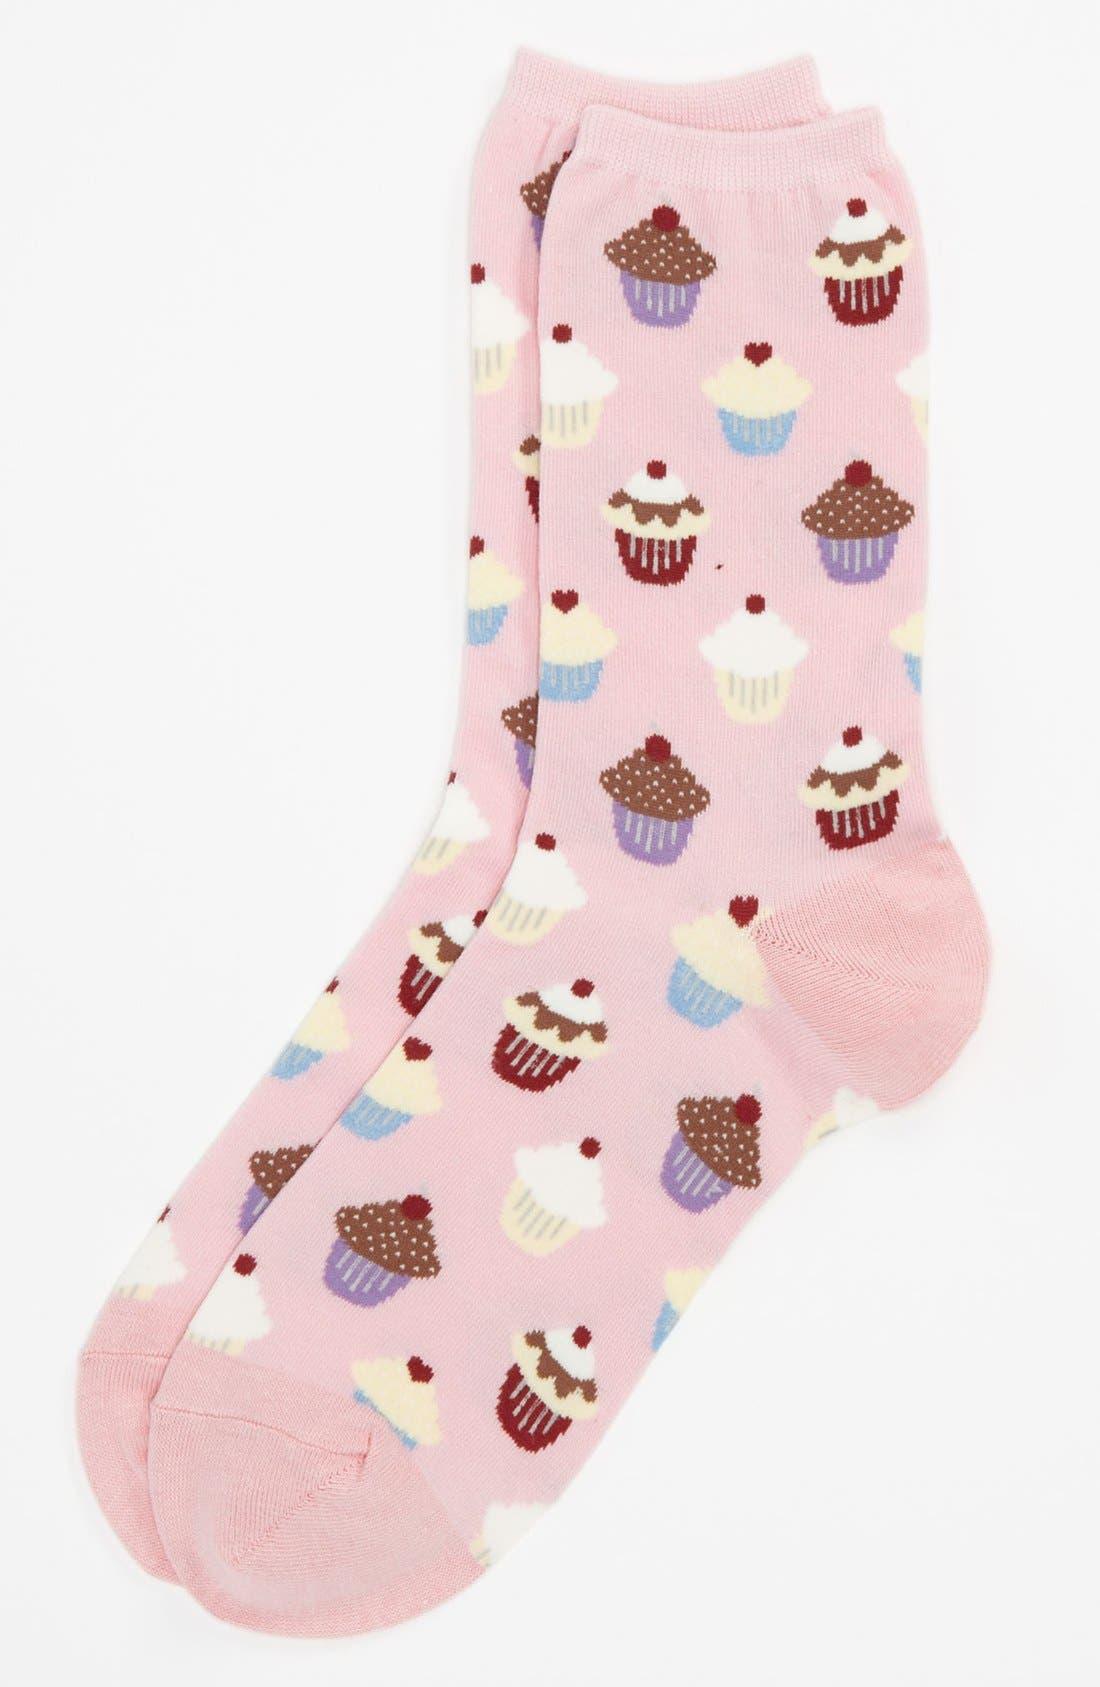 Alternate Image 1 Selected - Hot Sox 'Nostalgia' Socks